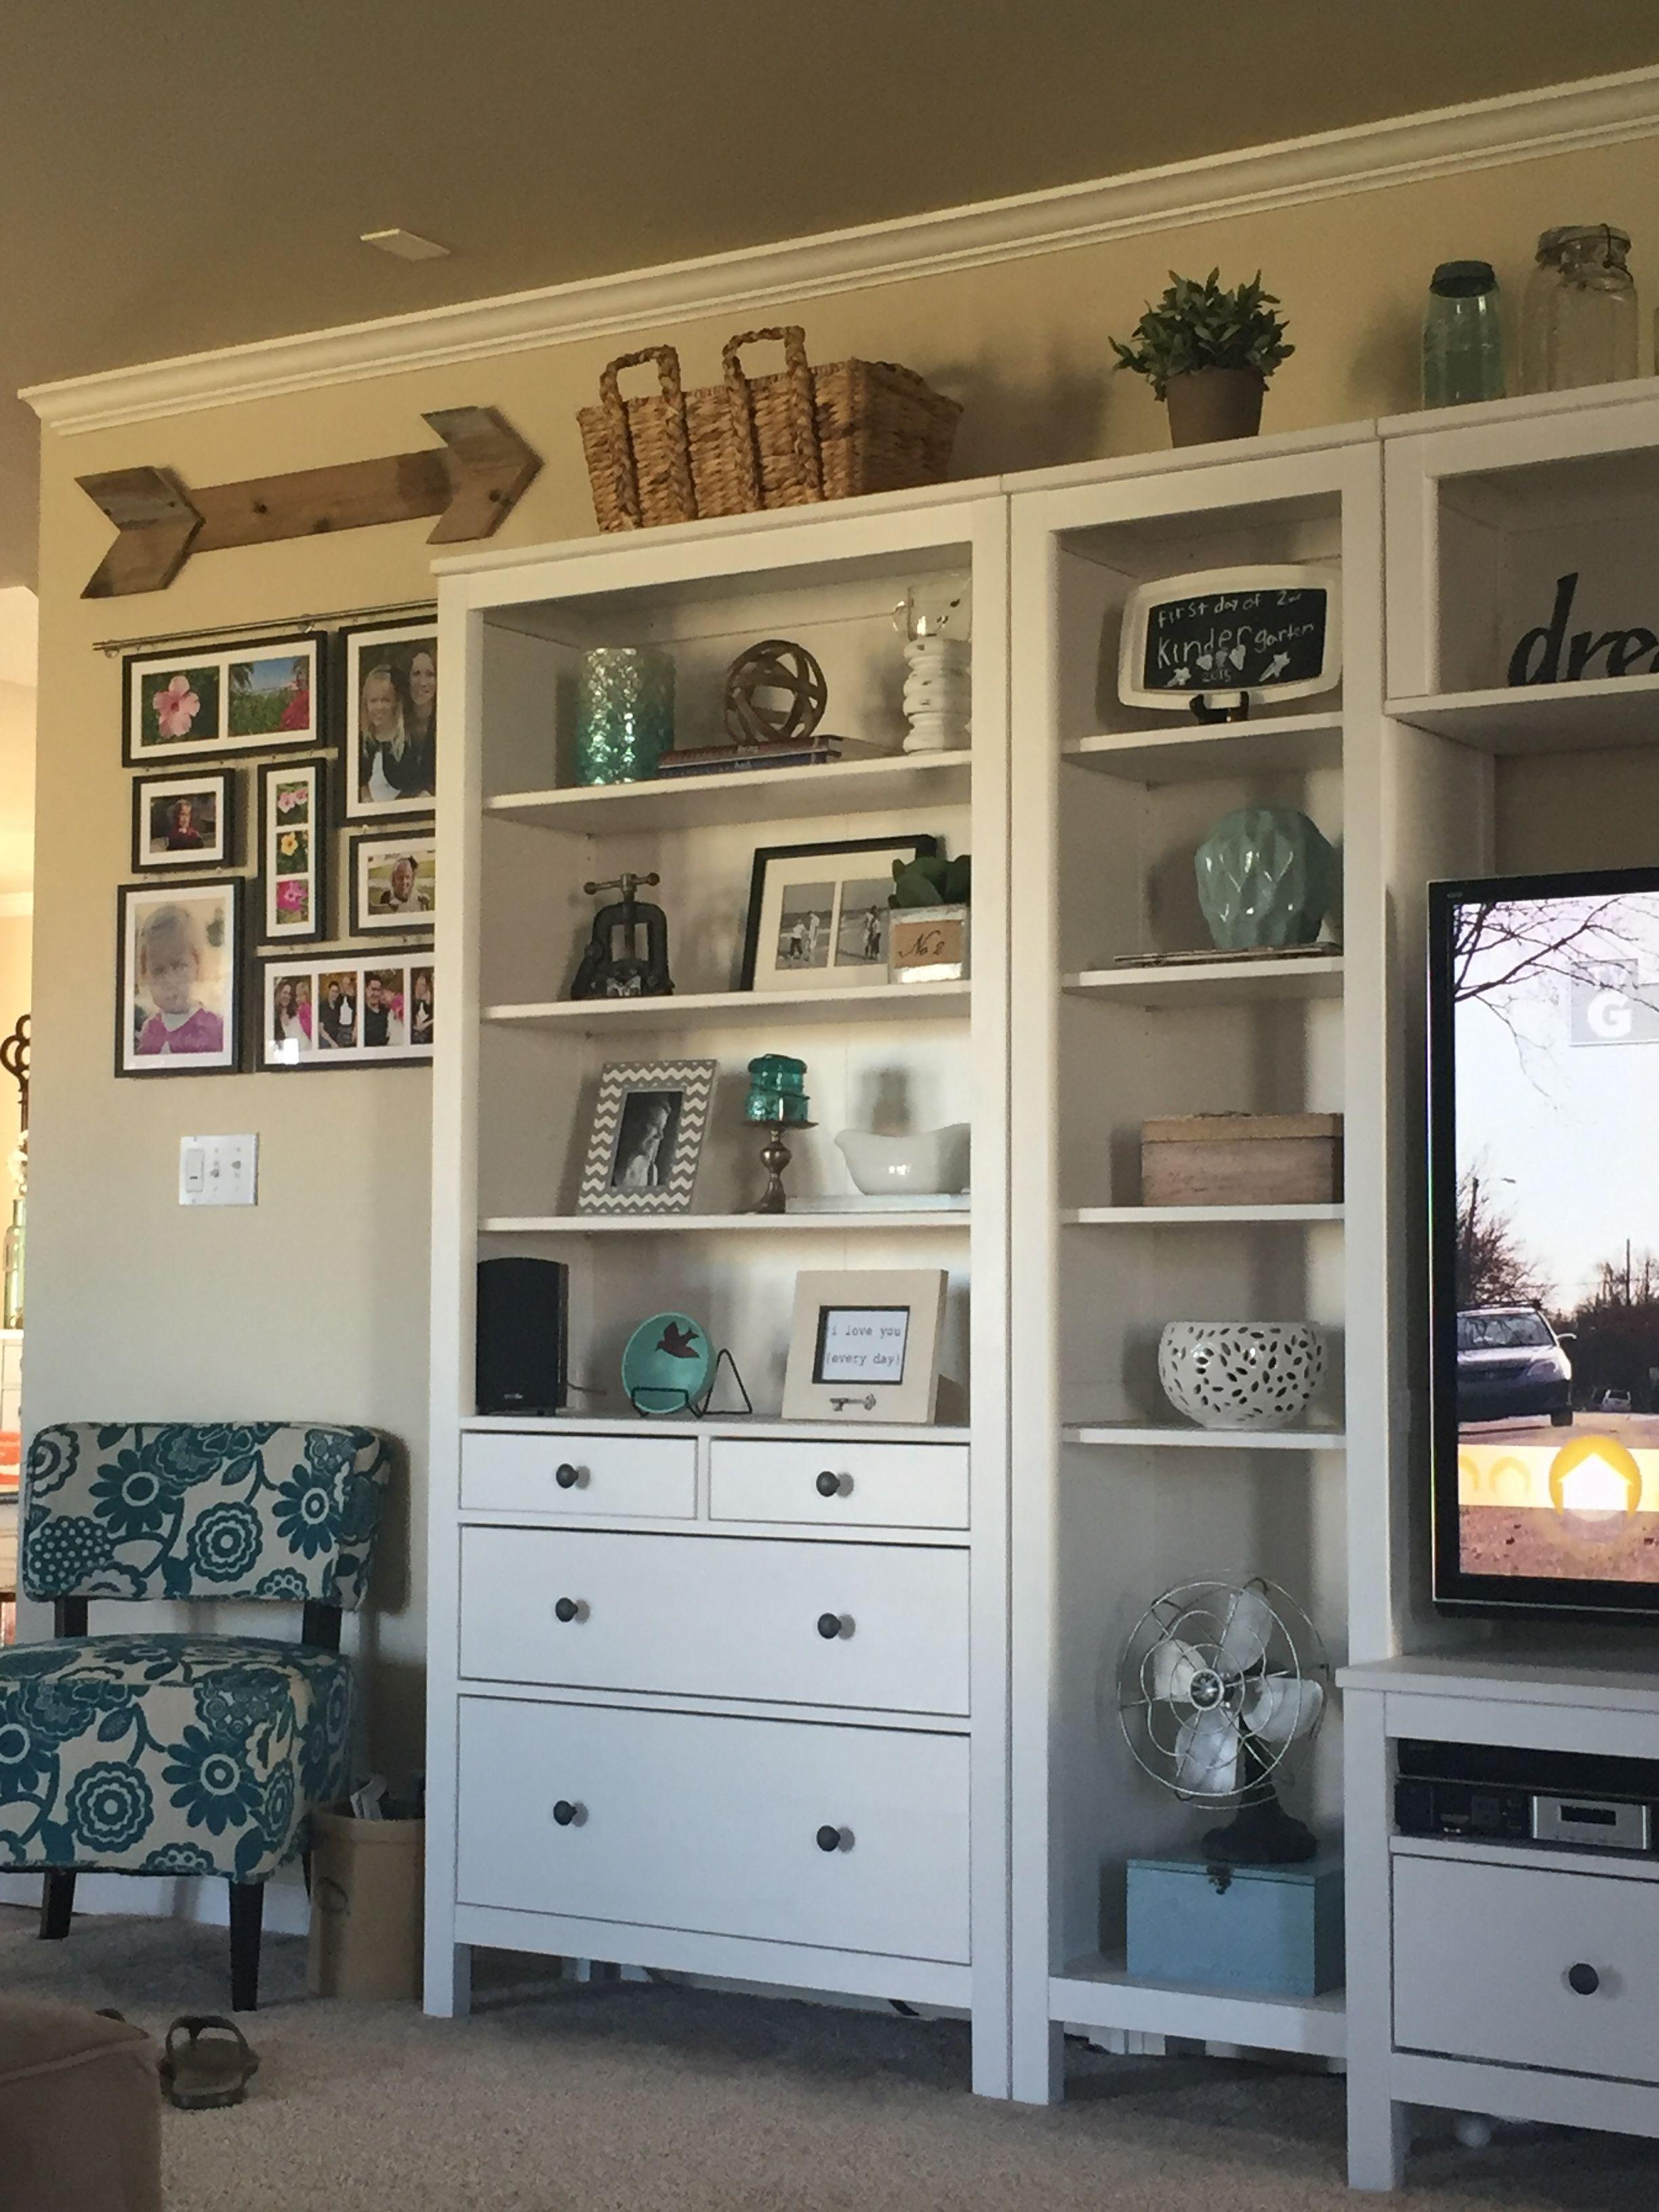 Ikea Hemnes entertainment center in living room   Home ...